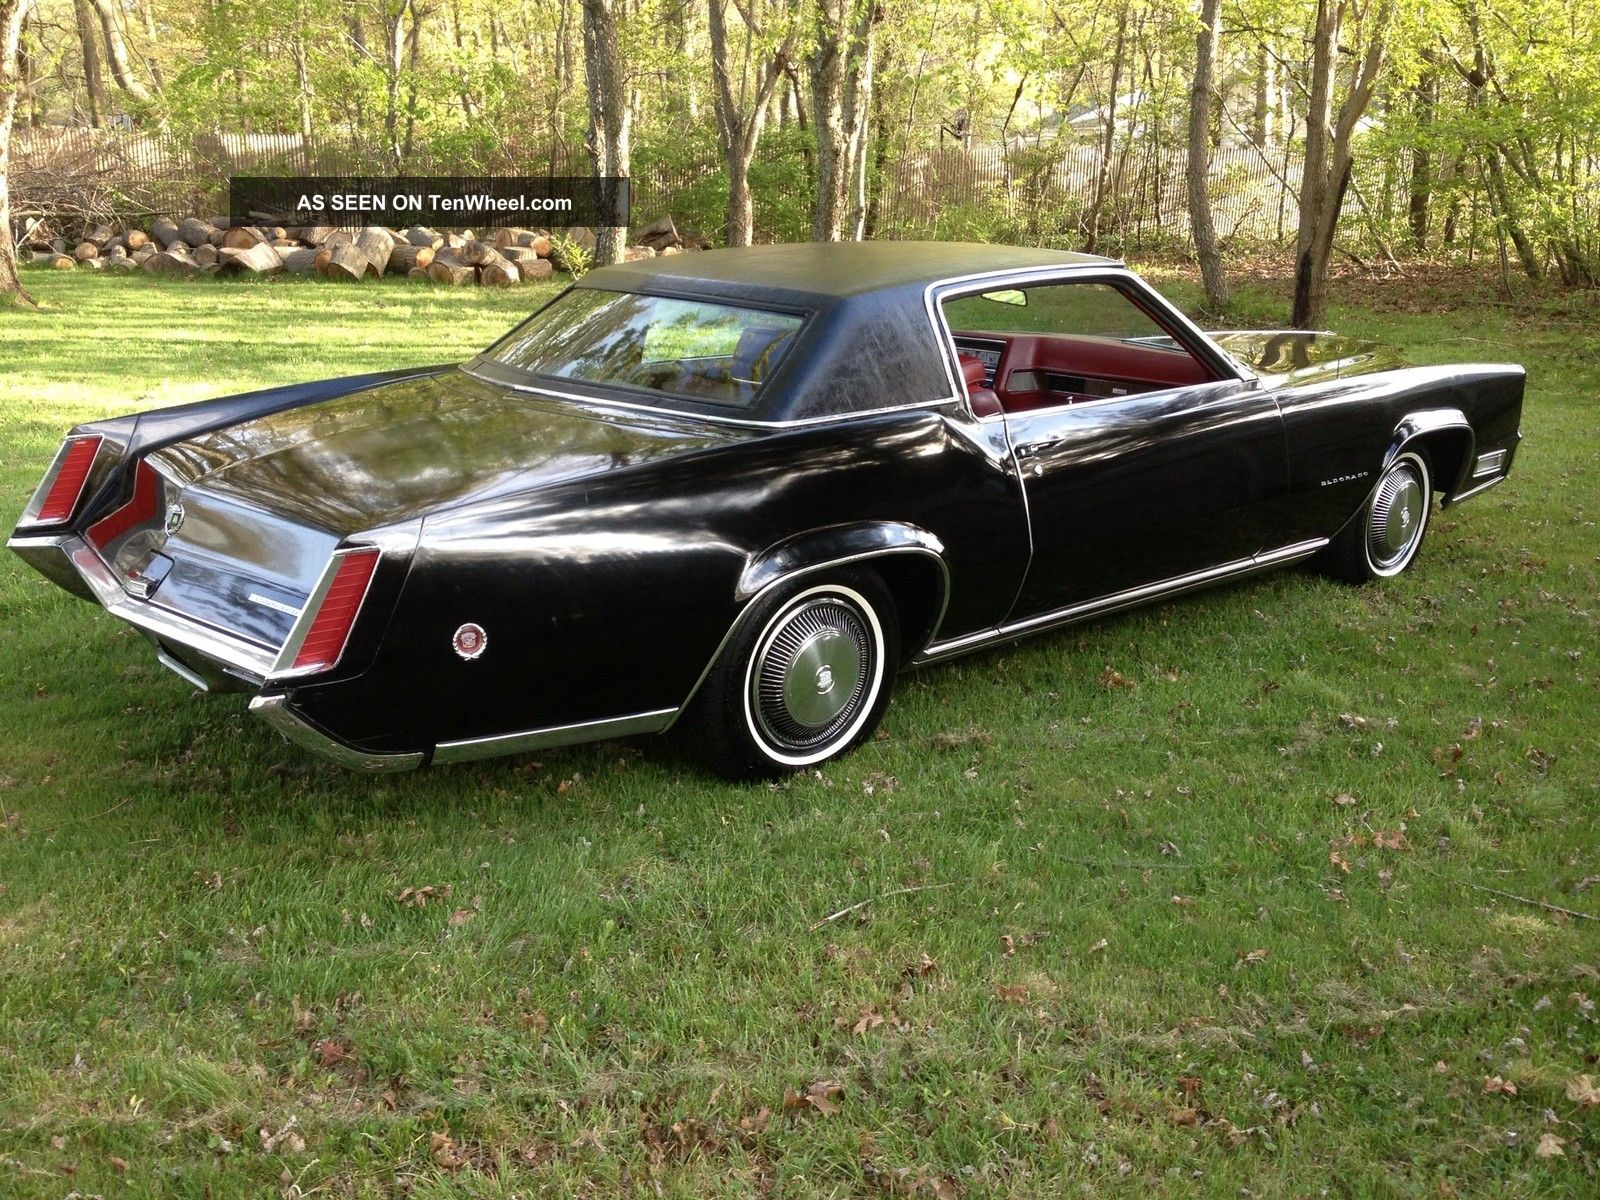 1964 Dodge Polara Wiring Diagram Get Free Image Auto 1967 Ford Ltd About